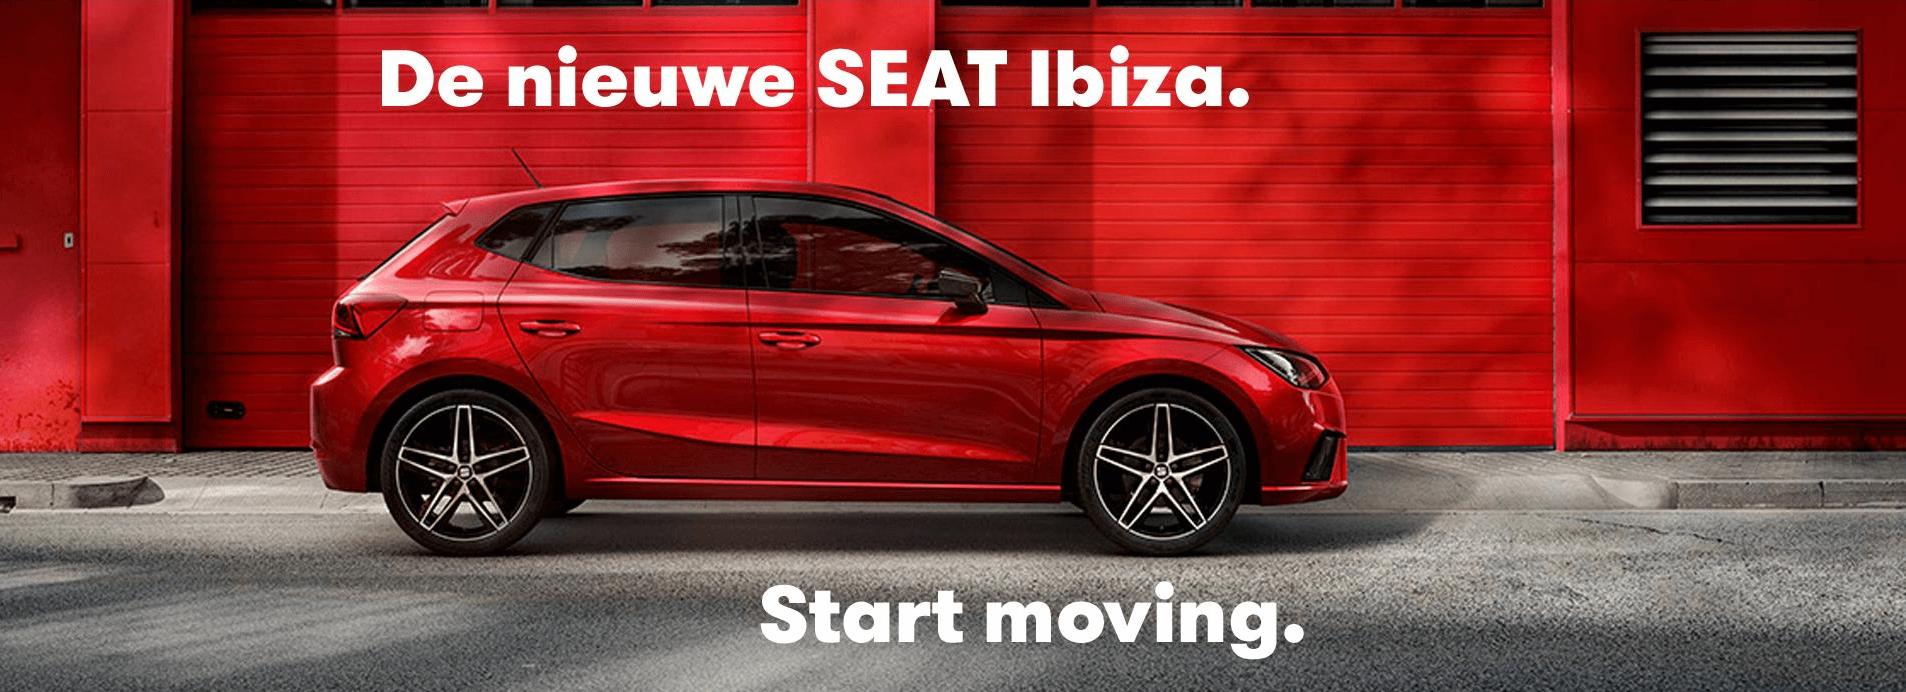 seat-ibiza-banner